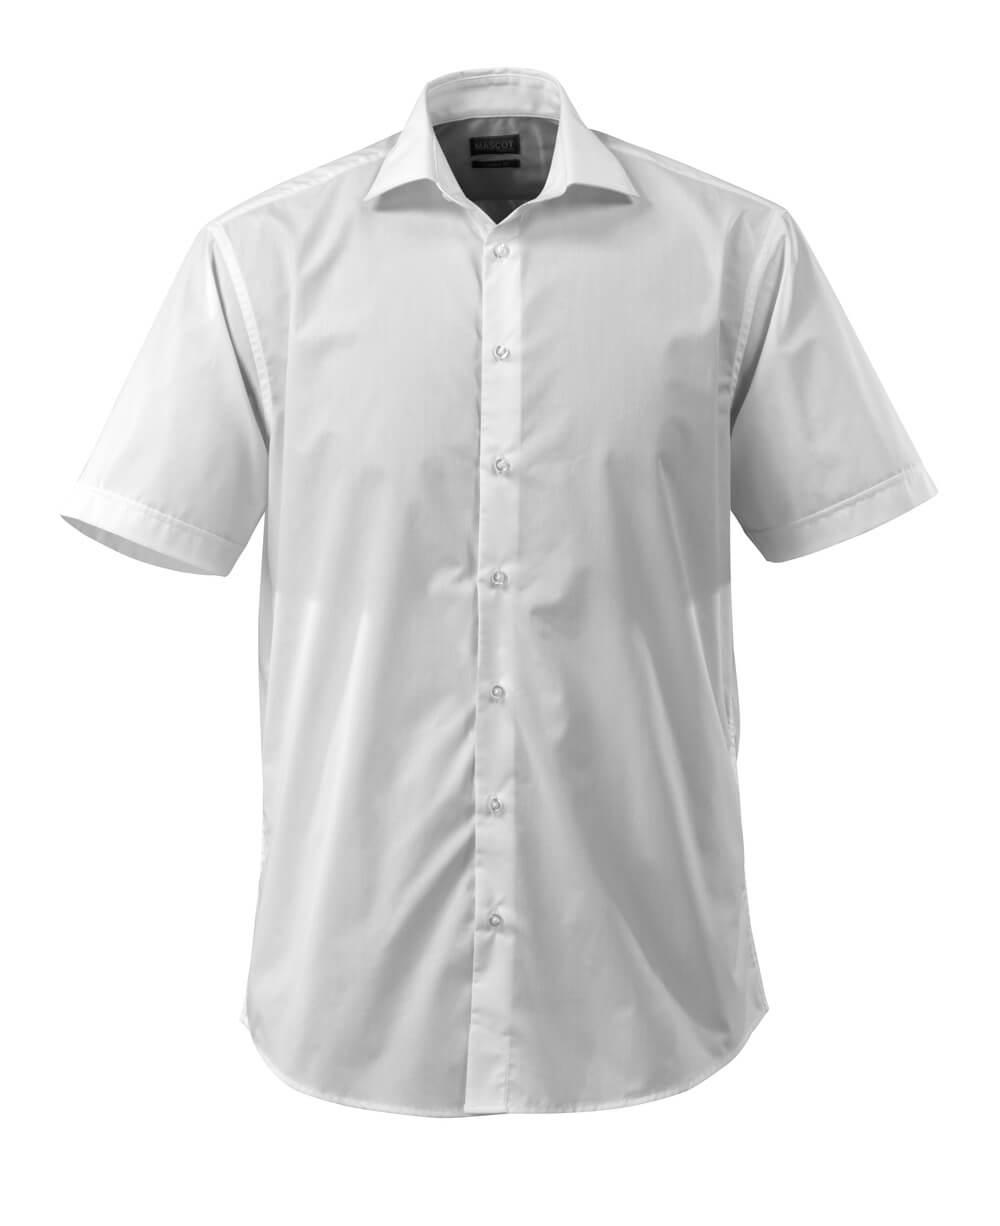 50632-984-06 Camicia, a maniche corte - bianco